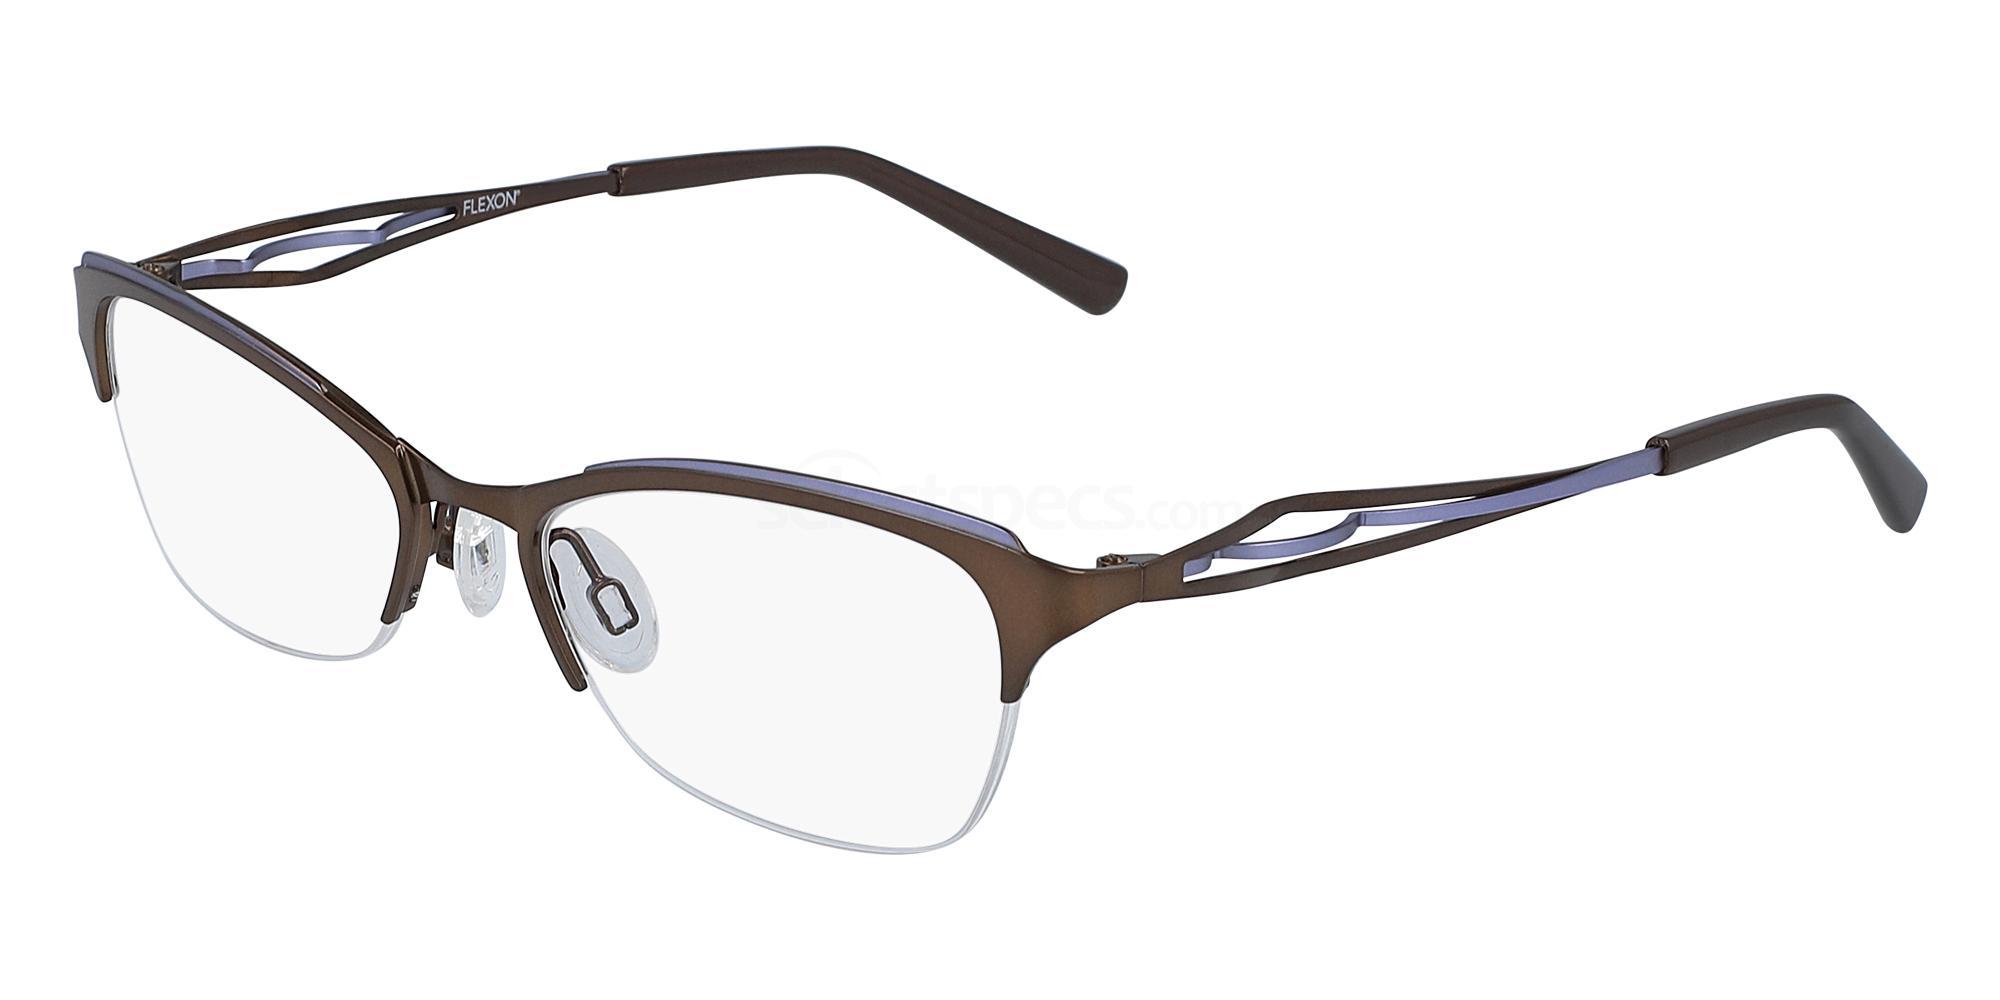 210 FLEXON W3001 Glasses, Flexon